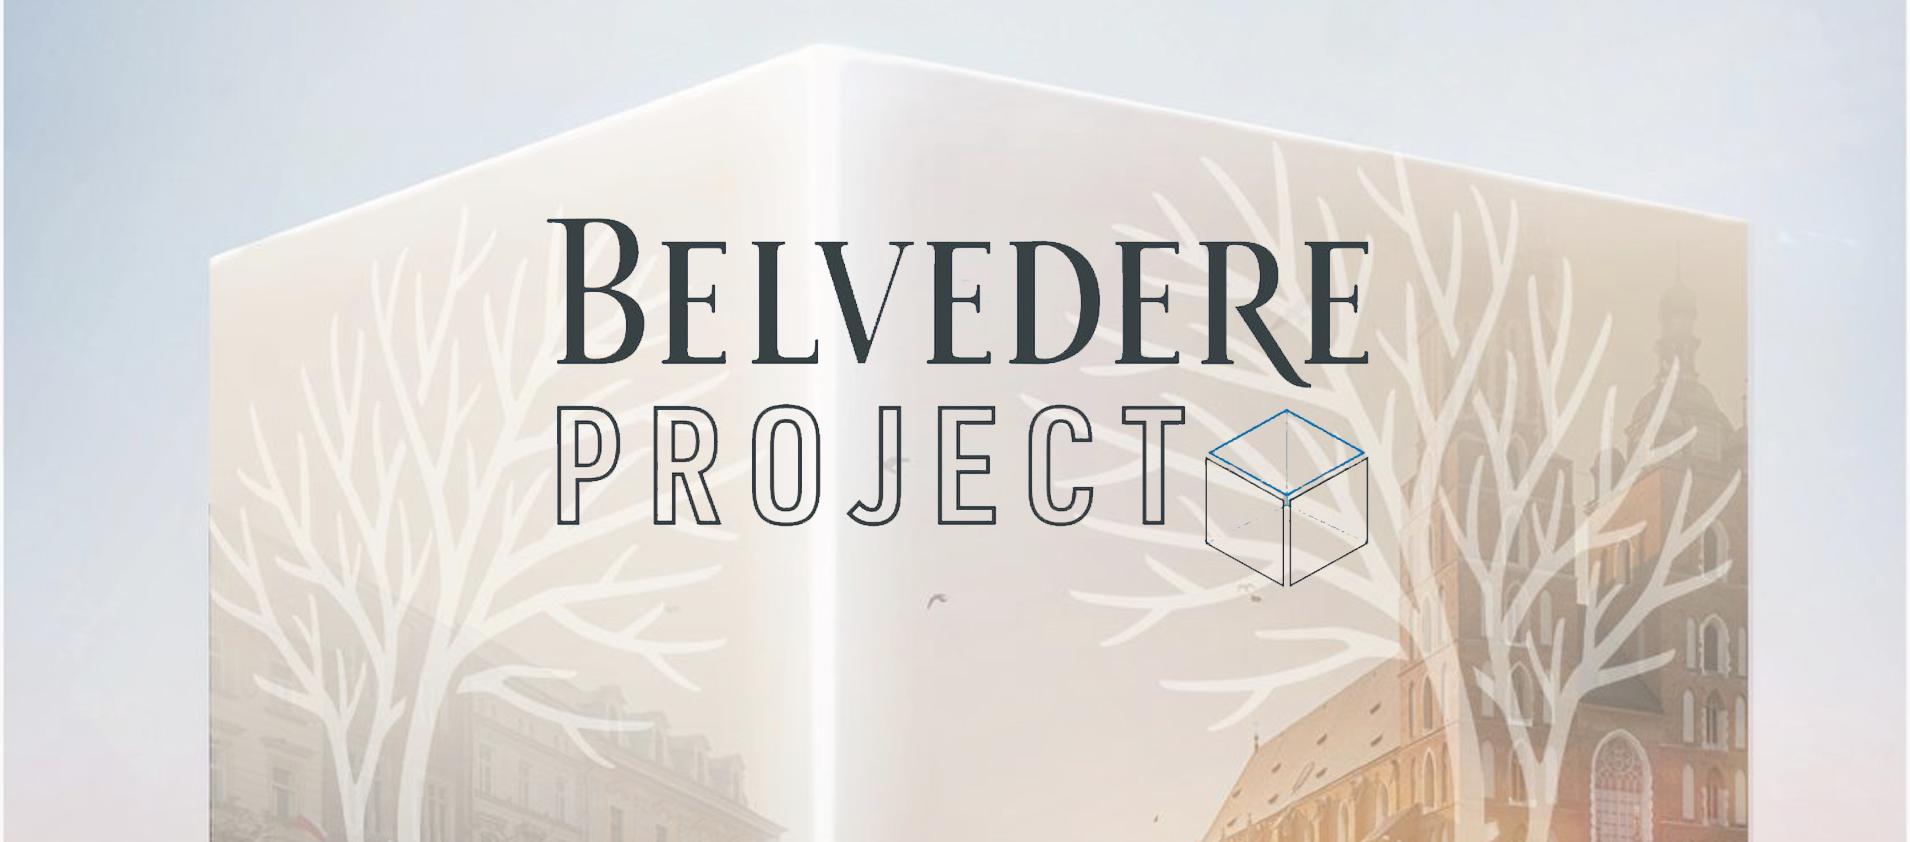 Belvedere Vodka Project